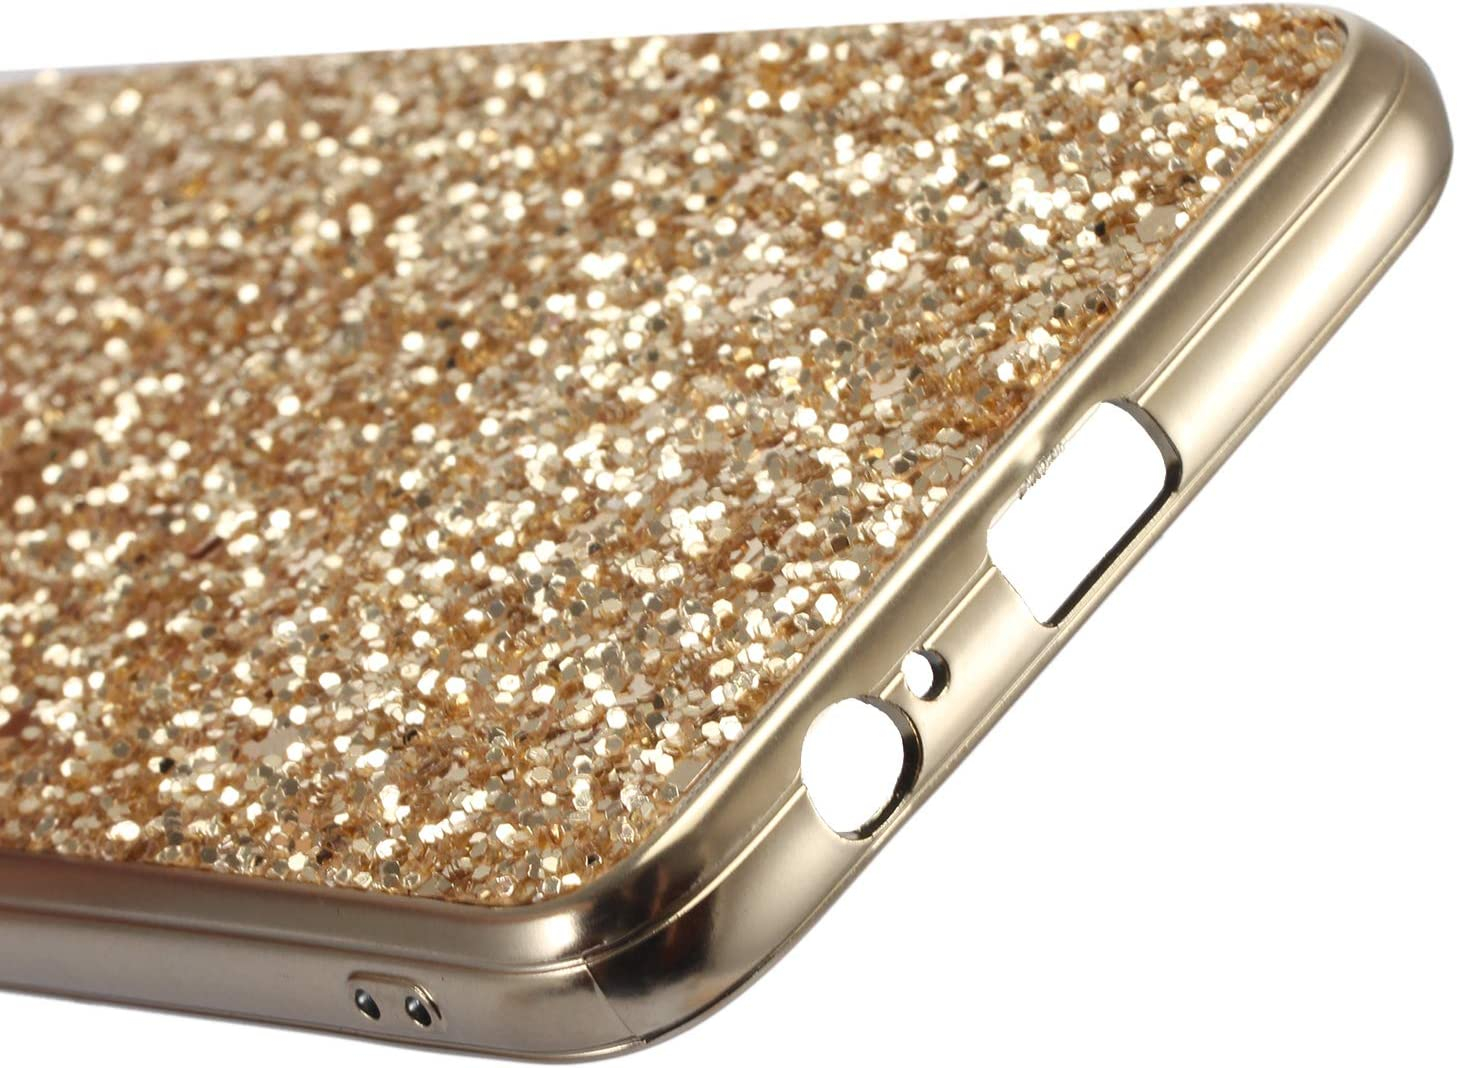 WIWJ Handyh/ülle Kompatibel f/ür Samsung Galaxy J8 2018 Glitzer Gold,Bling Sparkles Glitter Cover TPU Silikon Bumper Case Handy Schutzh/ülle f/ür Samsung Galaxy J8 2018 R/ückseite